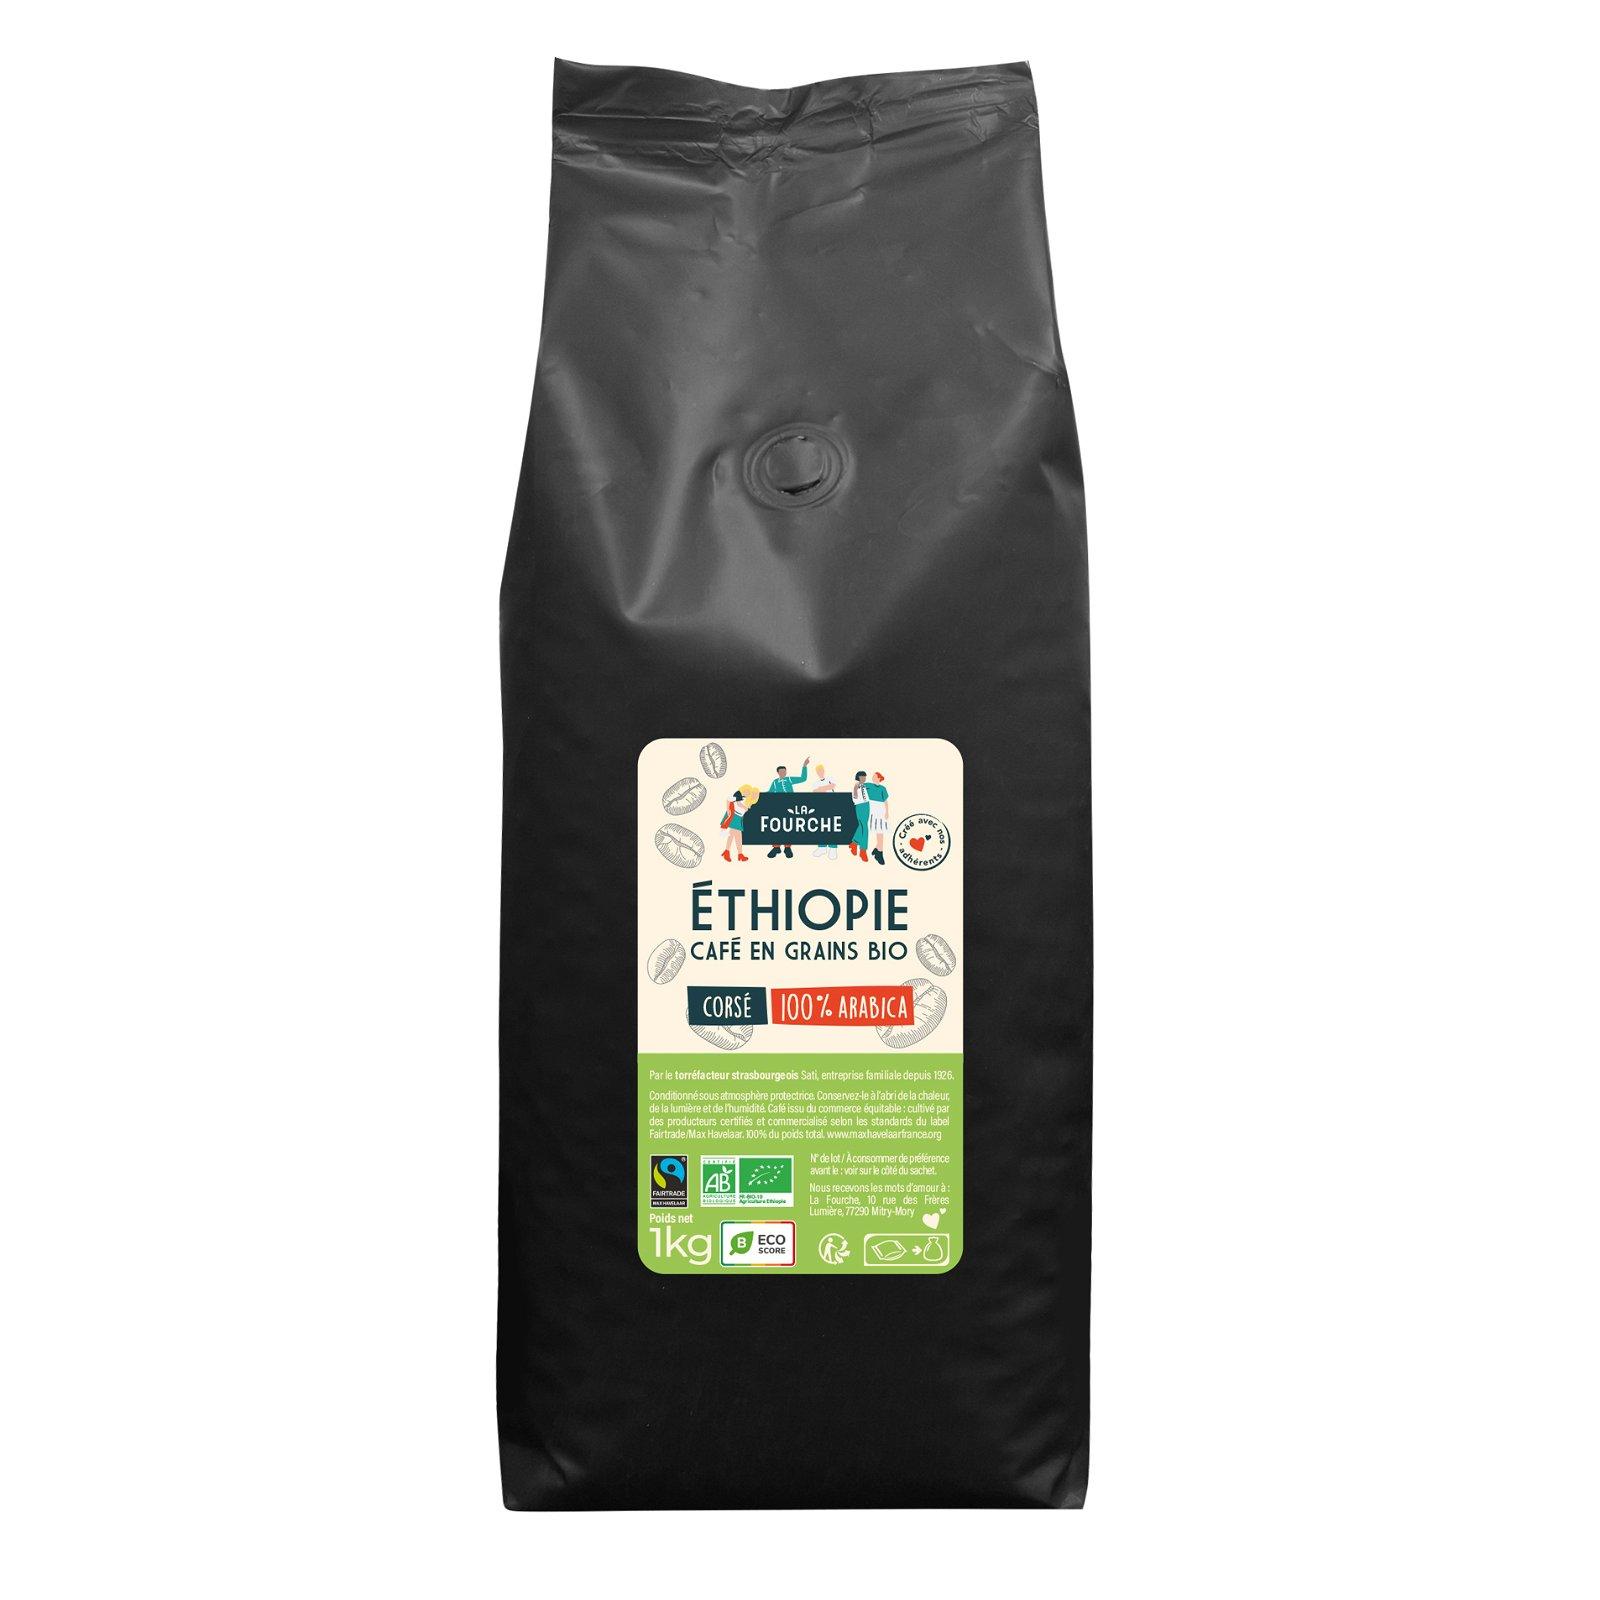 img-la-fourche-cafe-en-grains-arabica-corse-ethiopie-bio-equitable-1kg